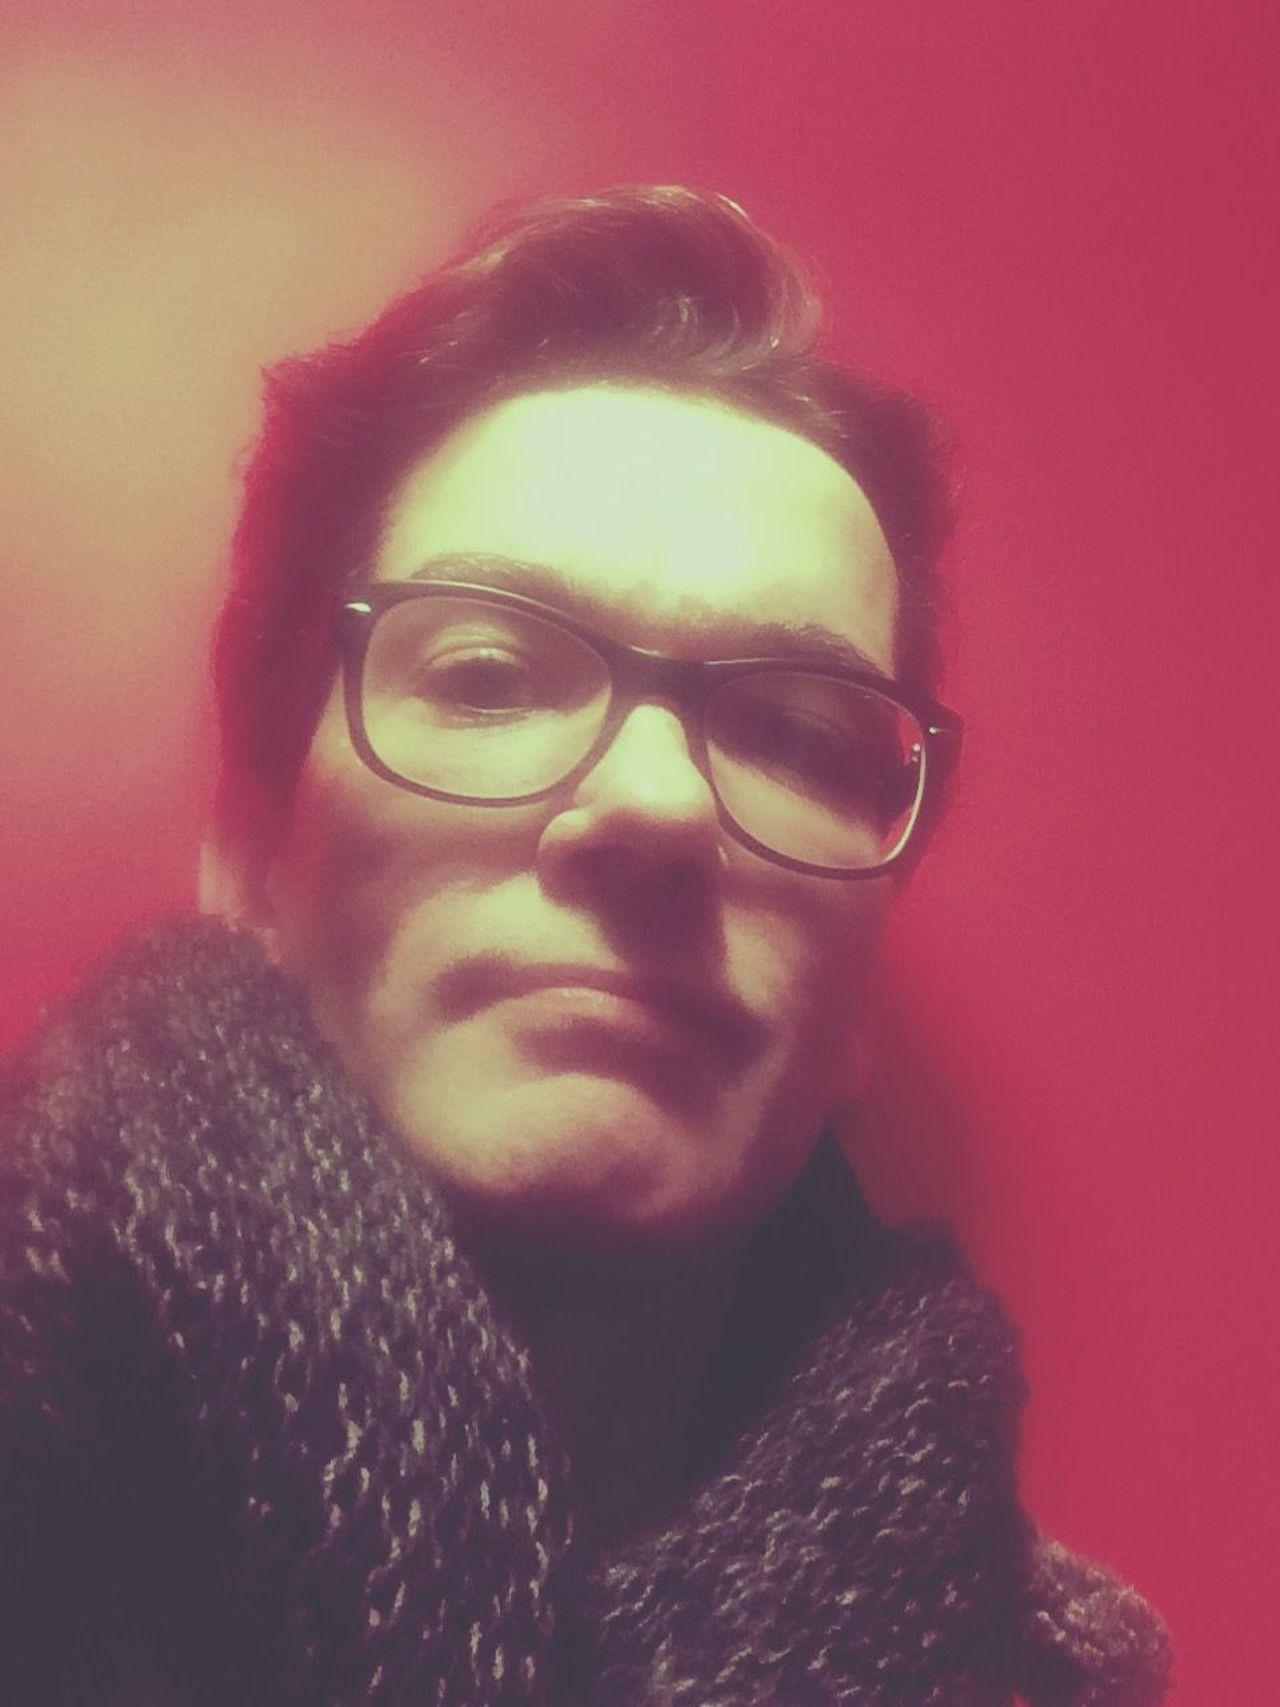 Foto: Manuel Gotzen App: Musemage Art: Selfie Date: 2017-05-05 http;// Designer  Gee Glasses Manuel Gotzen Self Selfie